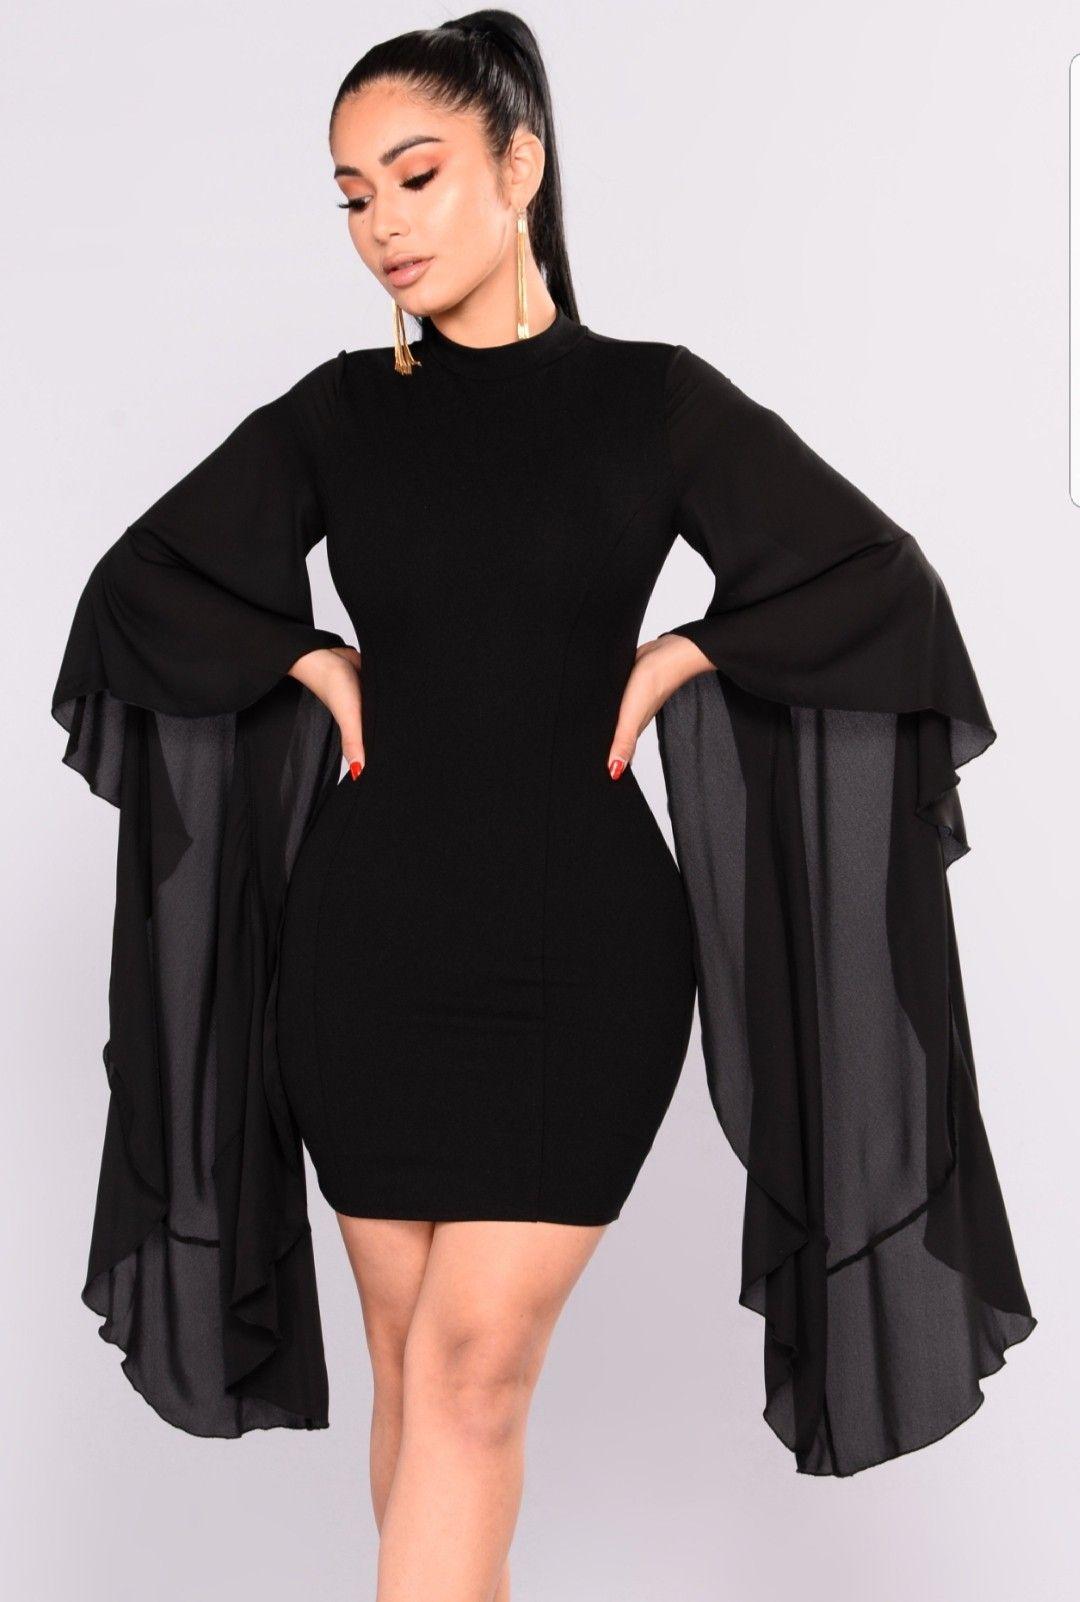 Extra Af Birthday Dress Fashionnova Black Dress White Long Sleeve Dress Black Attire